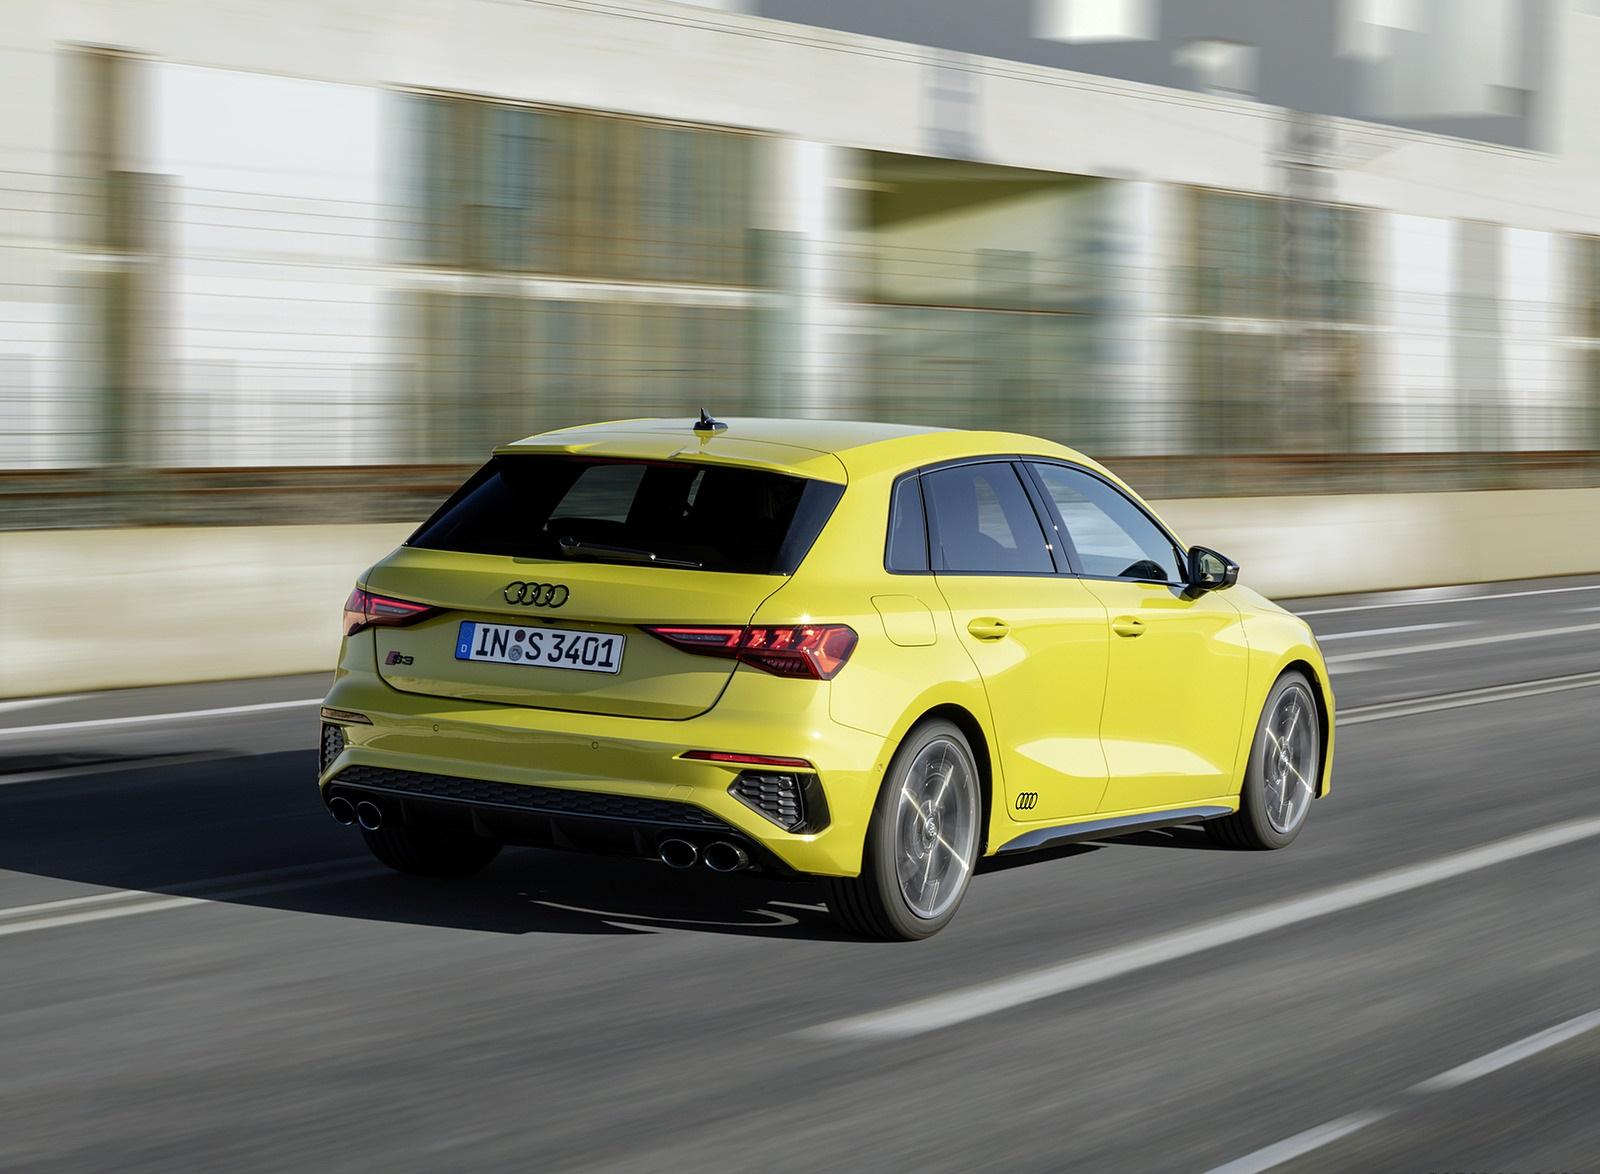 2021 Audi S3 Sportback (Color: Python Yellow) Rear Three-Quarter Wallpapers (9)